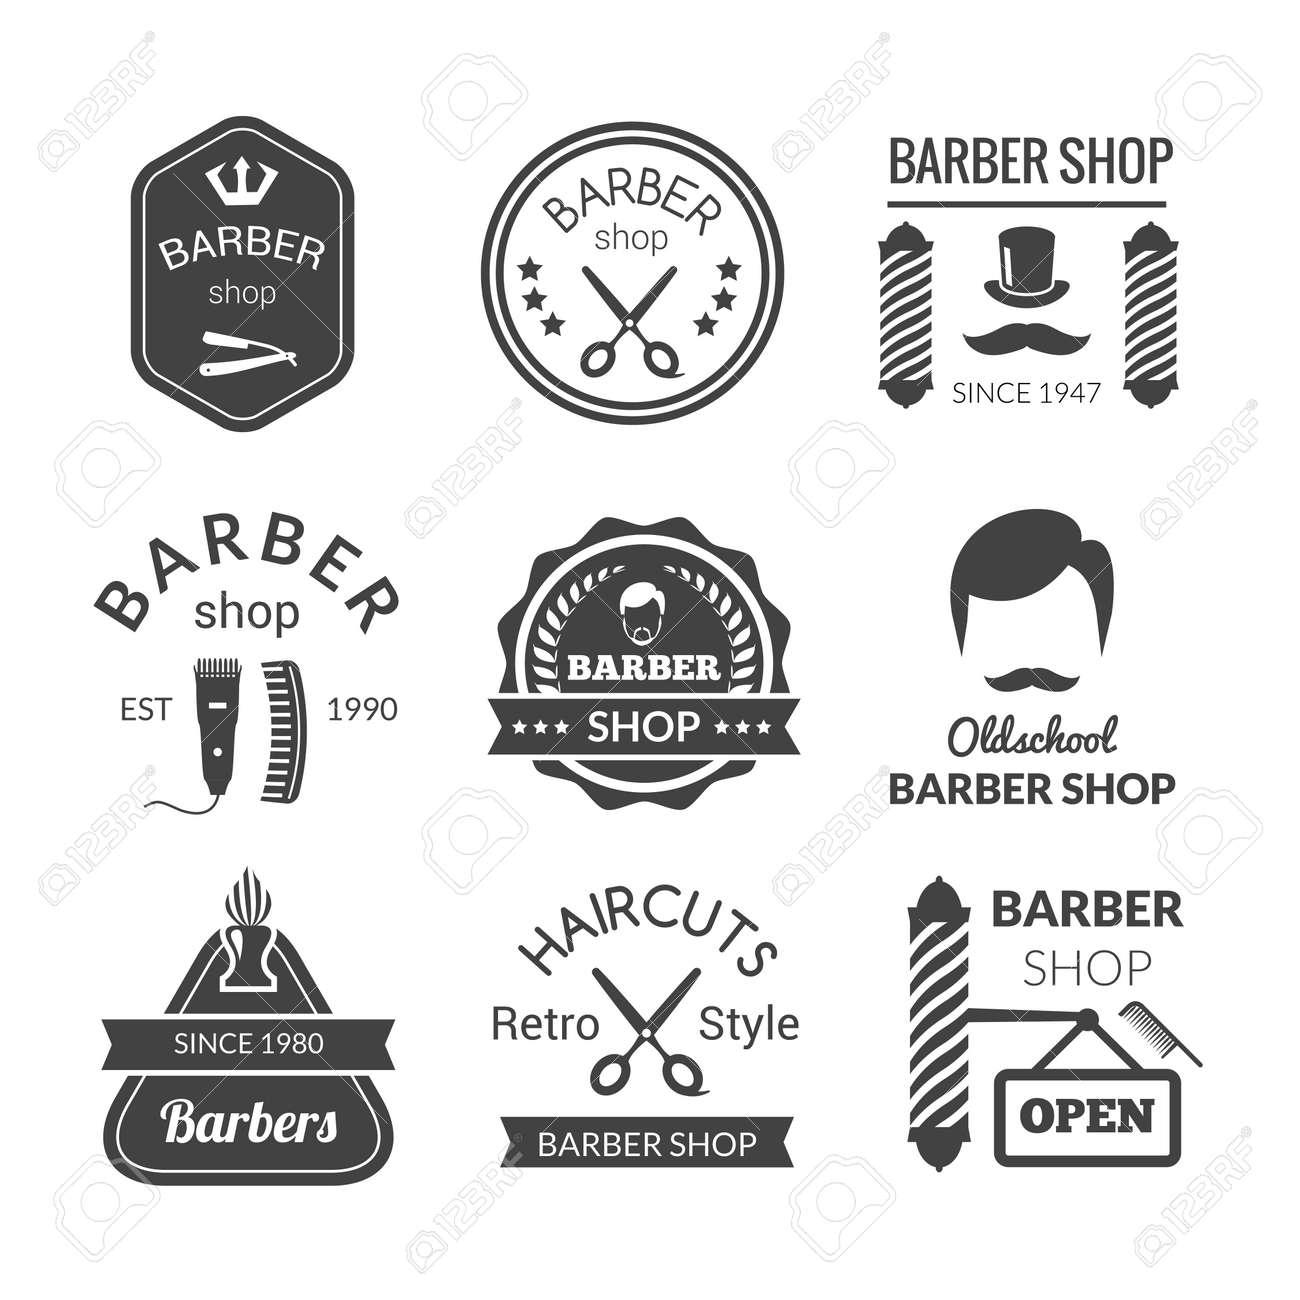 Barber shop emblems set with brush beard cream blade isolated vector illustration - 165739117